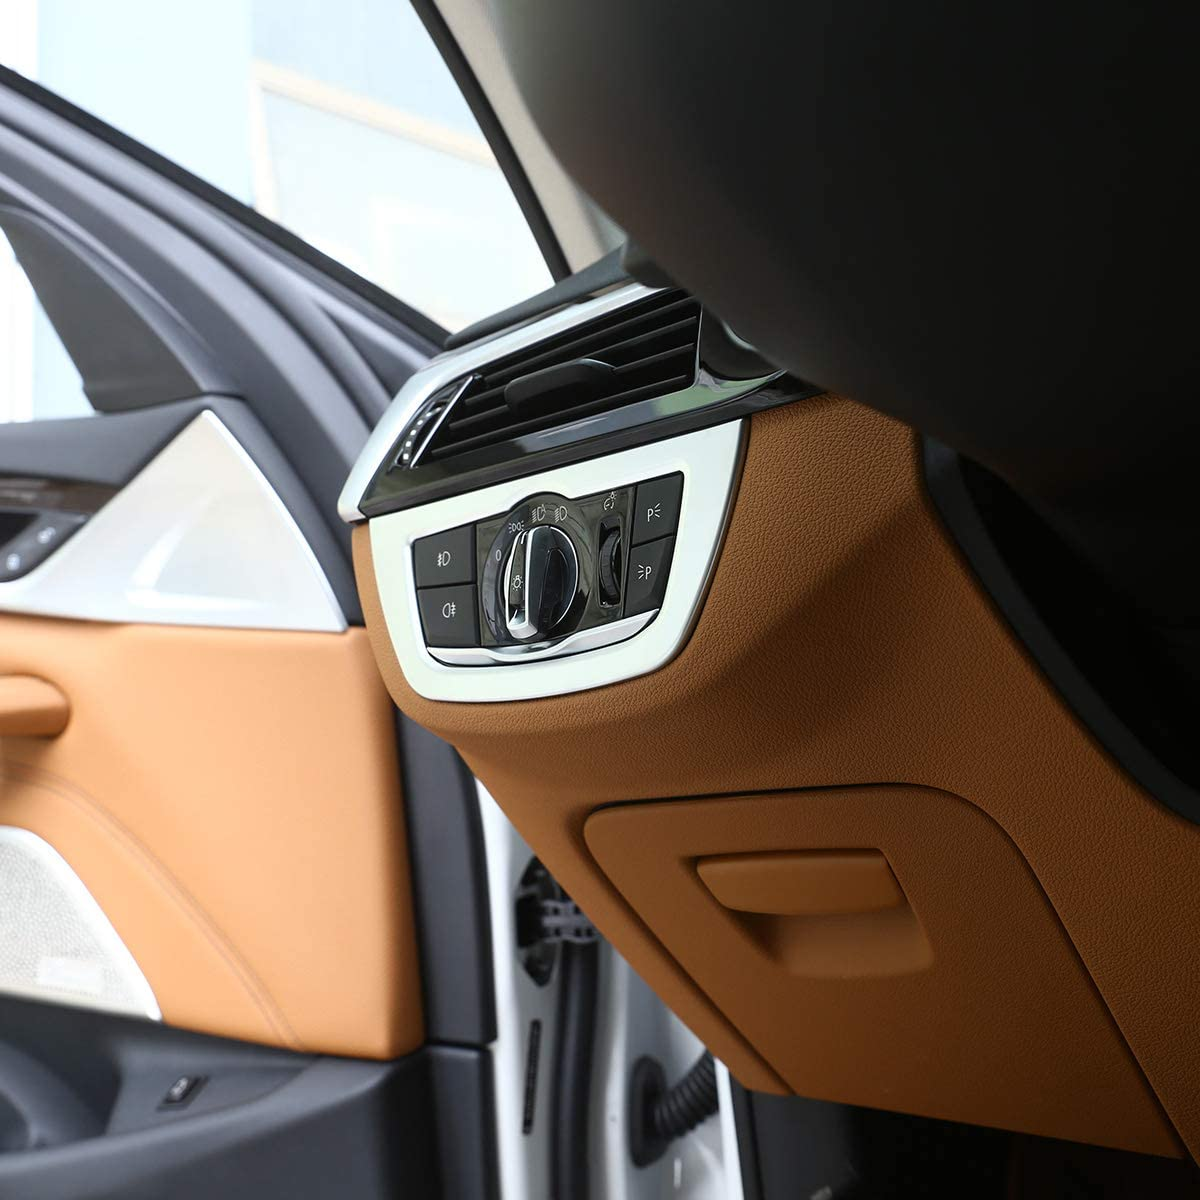 YUECHI Matte Silver ABS Chrome for BMW 5 Series G30 G31 2018 2019 Car Interior Headlight Frame Trim Accessories